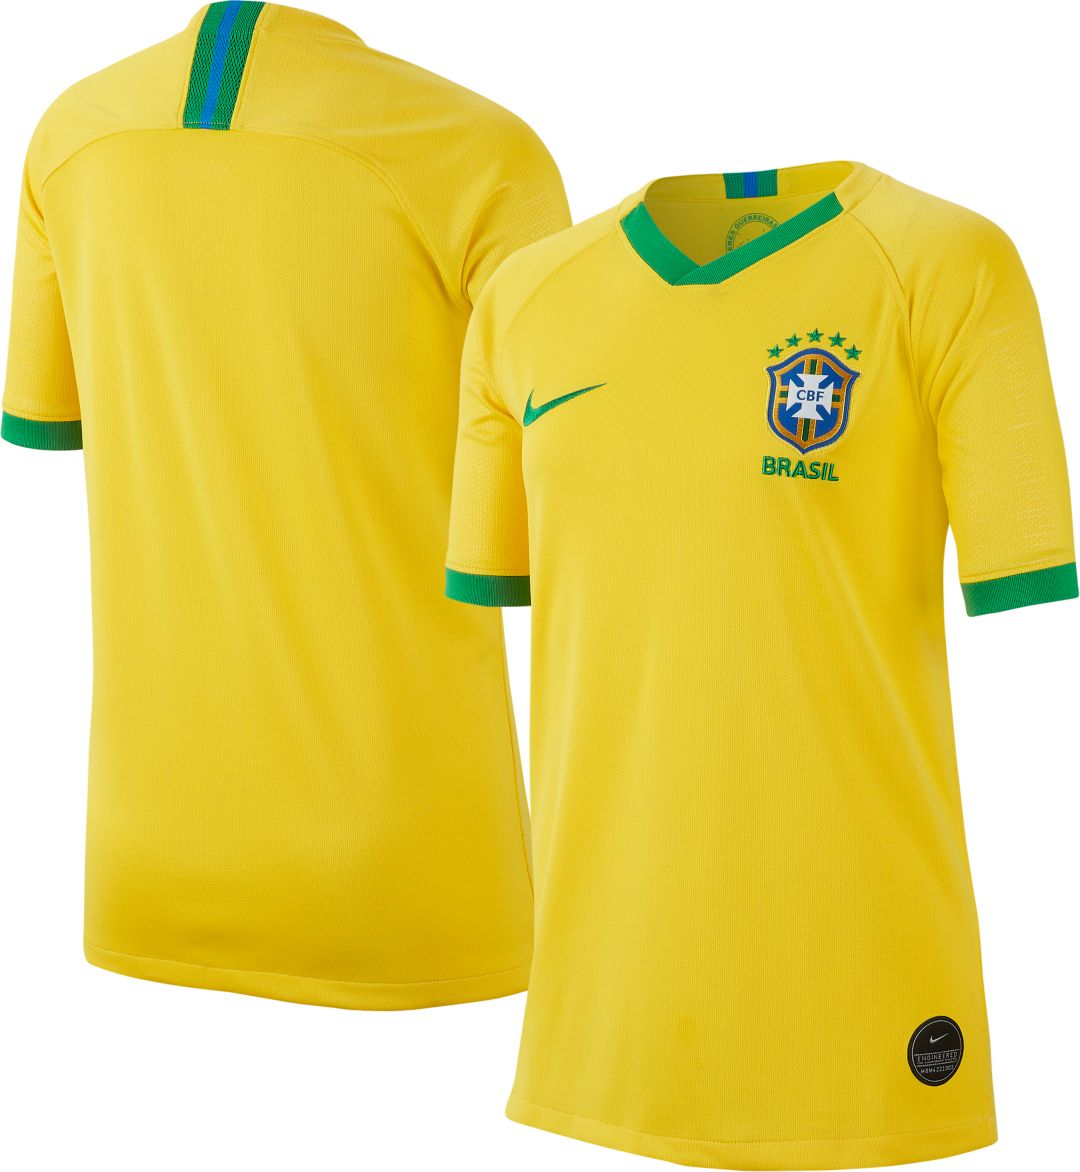 innovative design 2afb7 7ed89 Nike Youth 2019 FIFA Women's World Cup Brazil Breathe Stadium Home Replica  Jersey